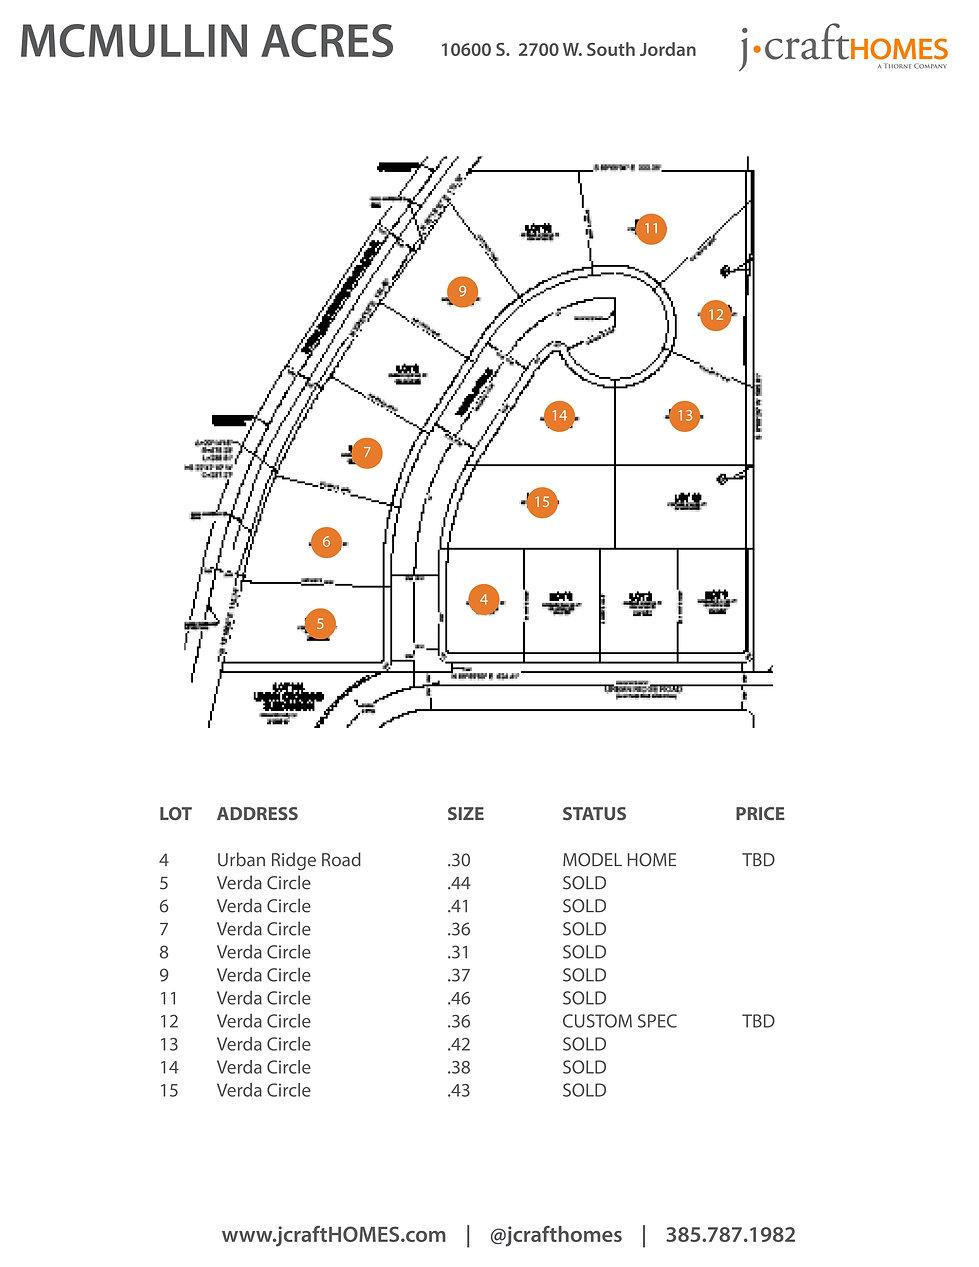 McMullin Acres.jpg